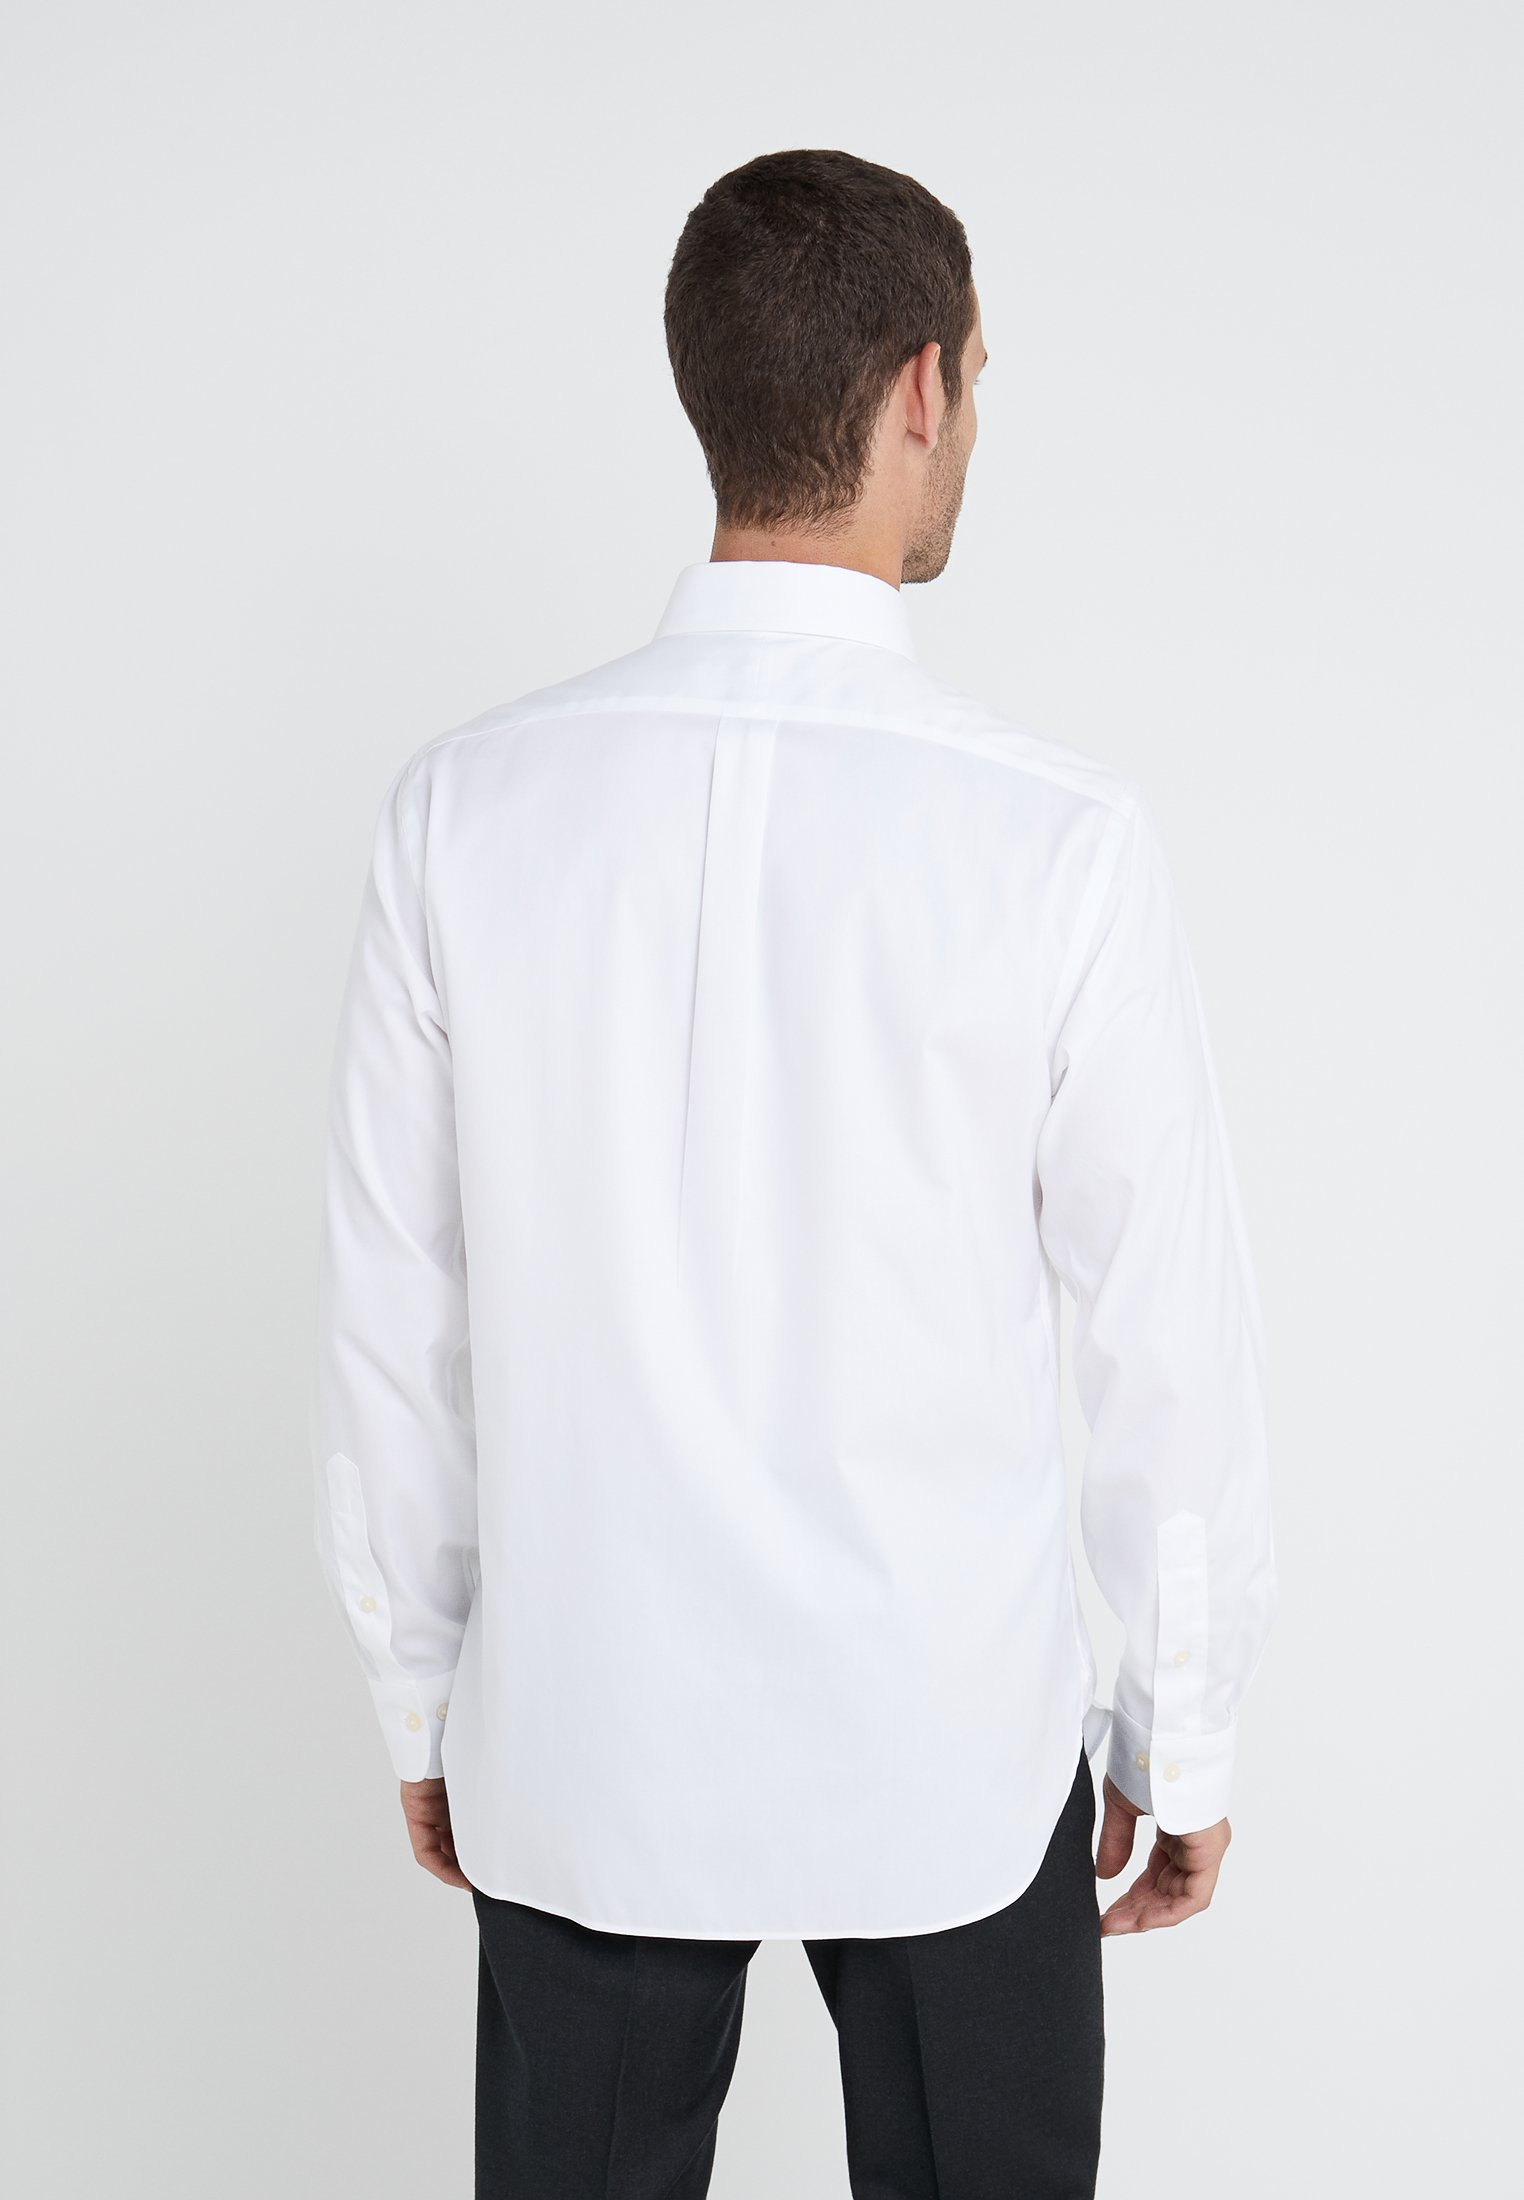 Men EASYCARE PINPOINT OXFORD CUSTOM FIT - Shirt